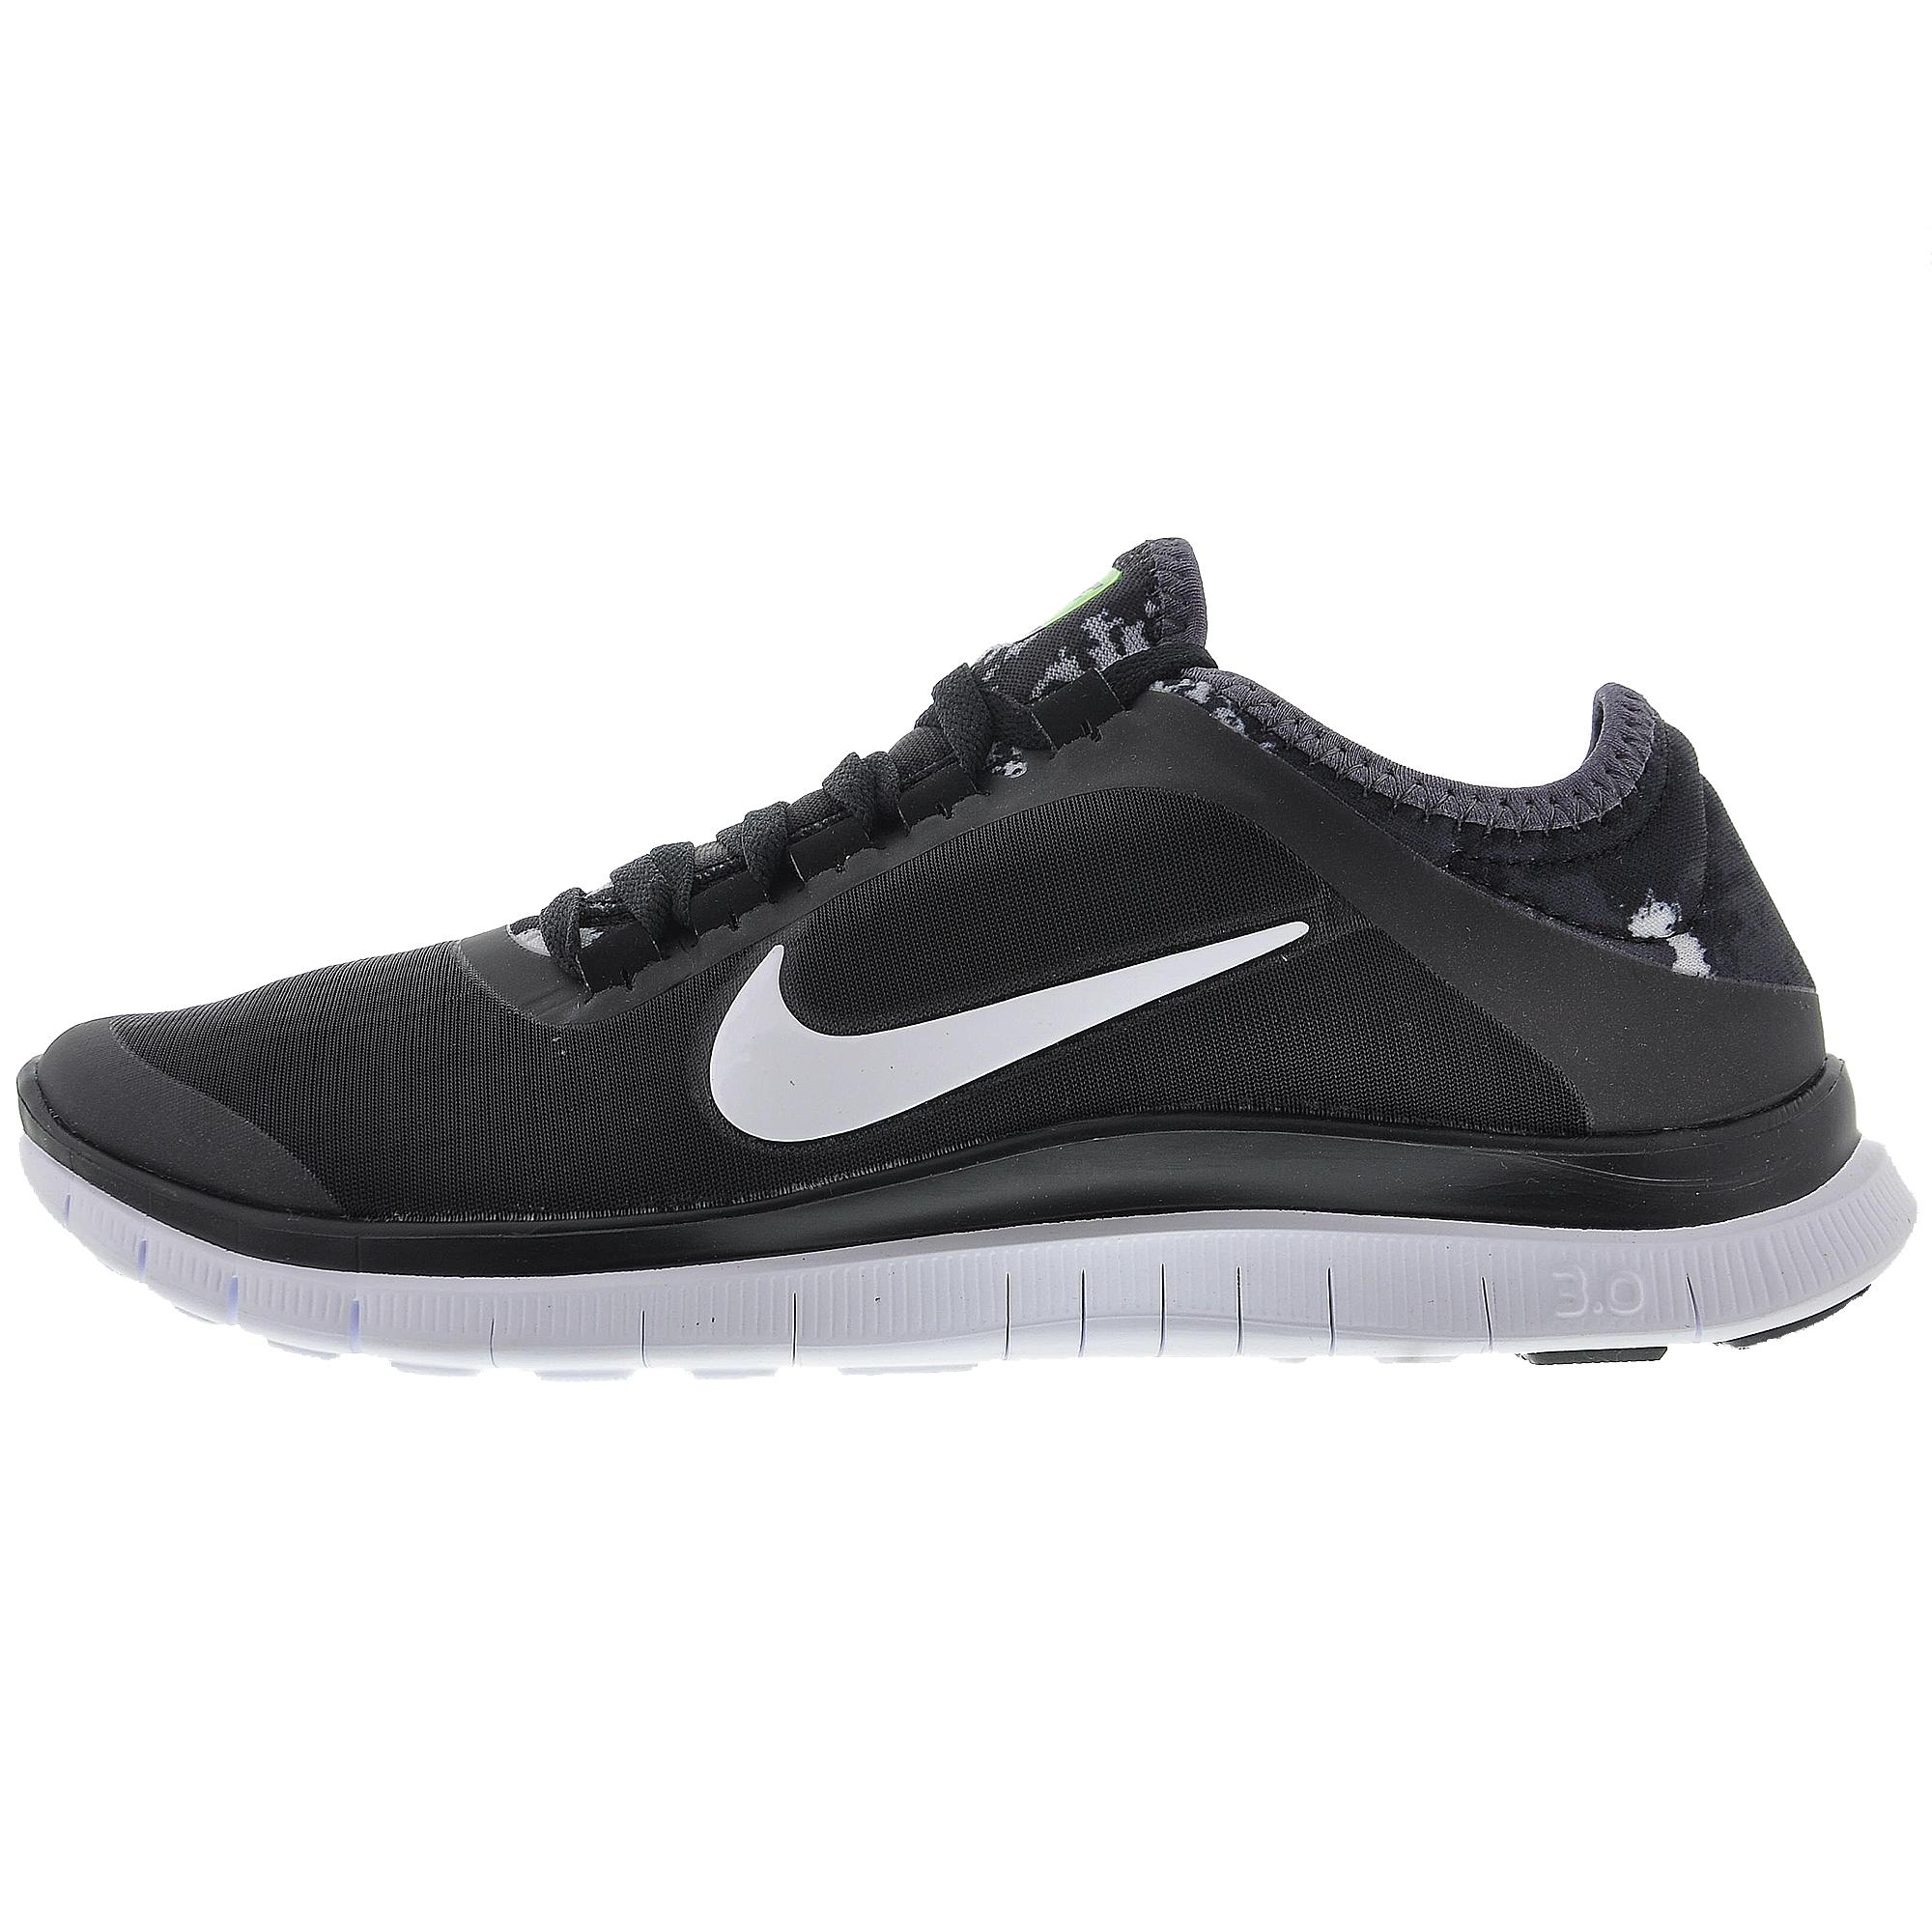 buy popular 35cf8 5578a Nike Free 3.0 V5 Ext Print Kadın Spor Ayakkabı